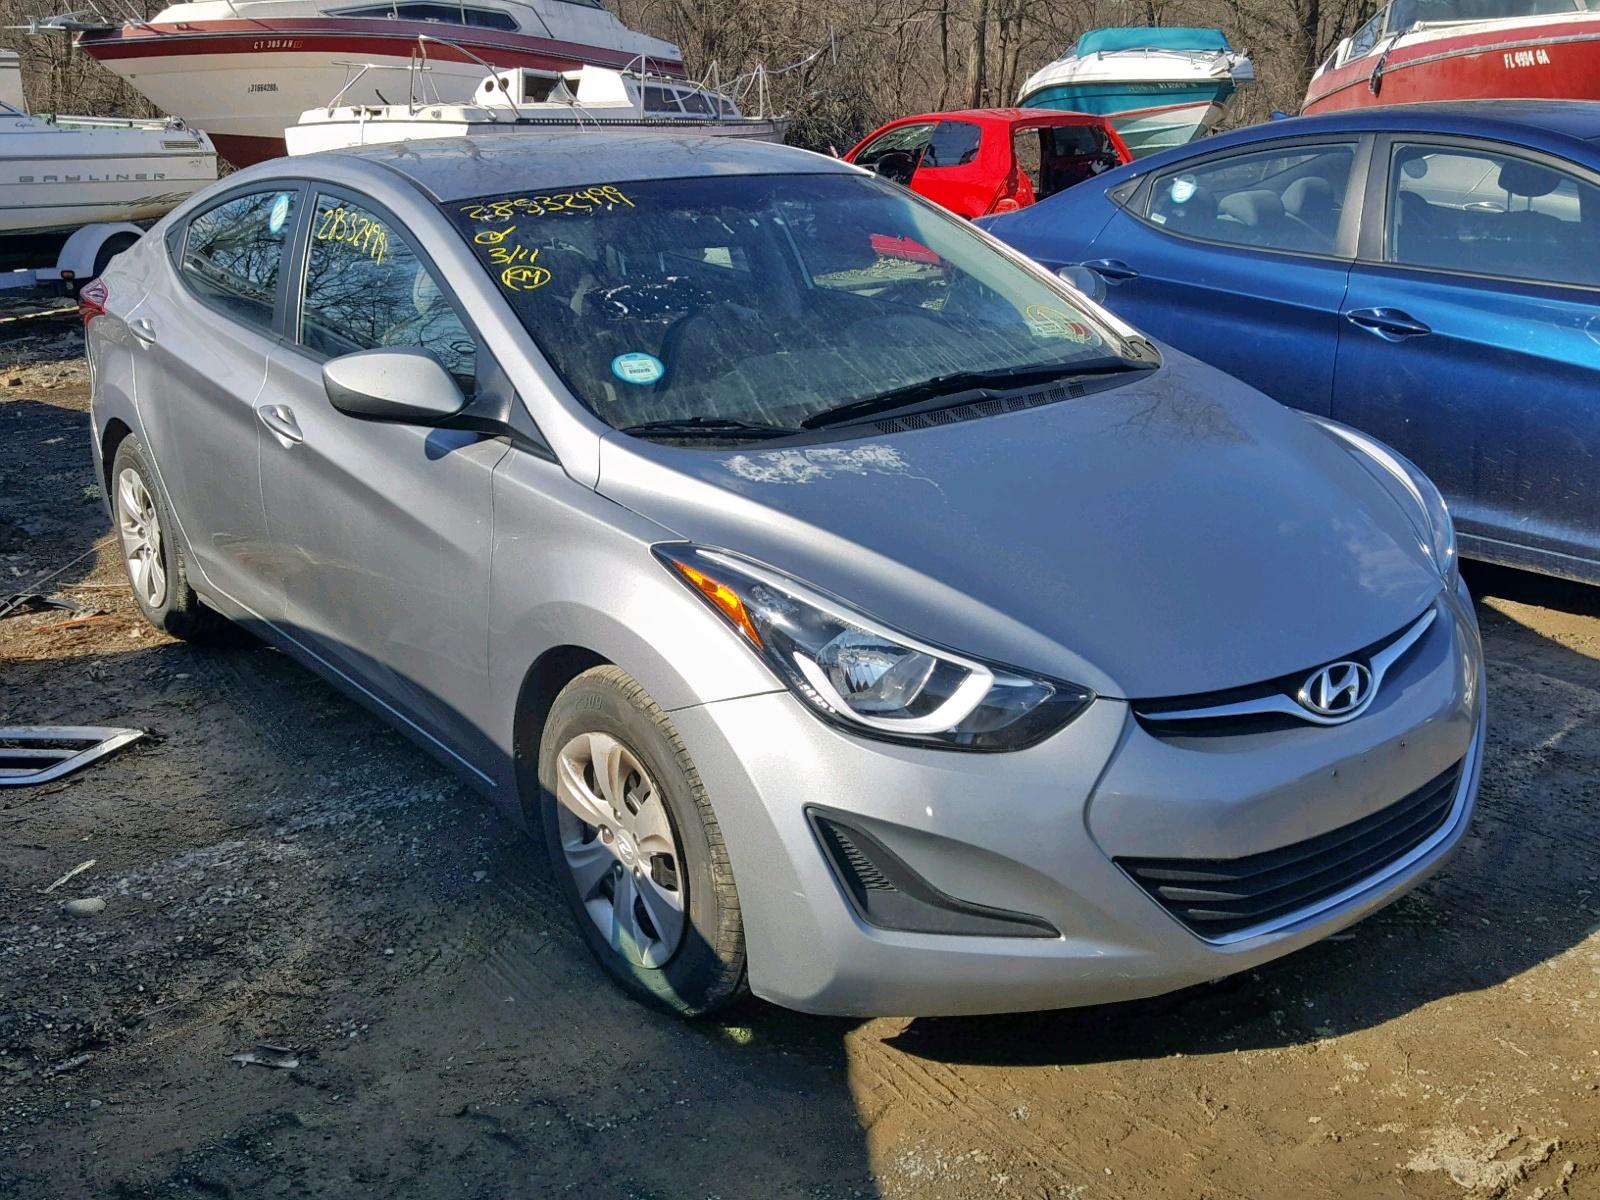 2016 Hyundai Elantra Se 1.8L Left View